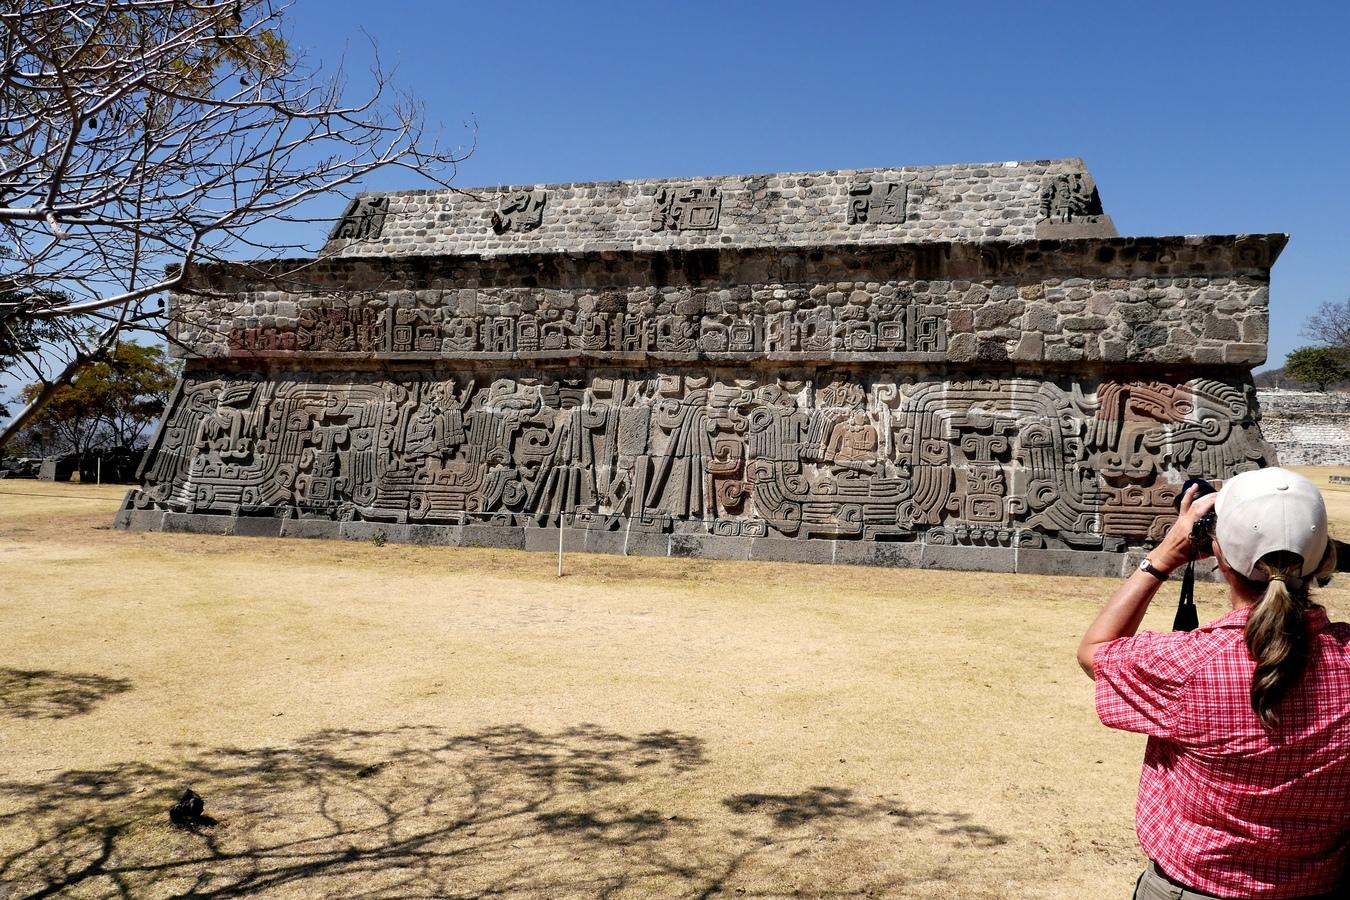 Chrám opeřeného hada - Xochicalco